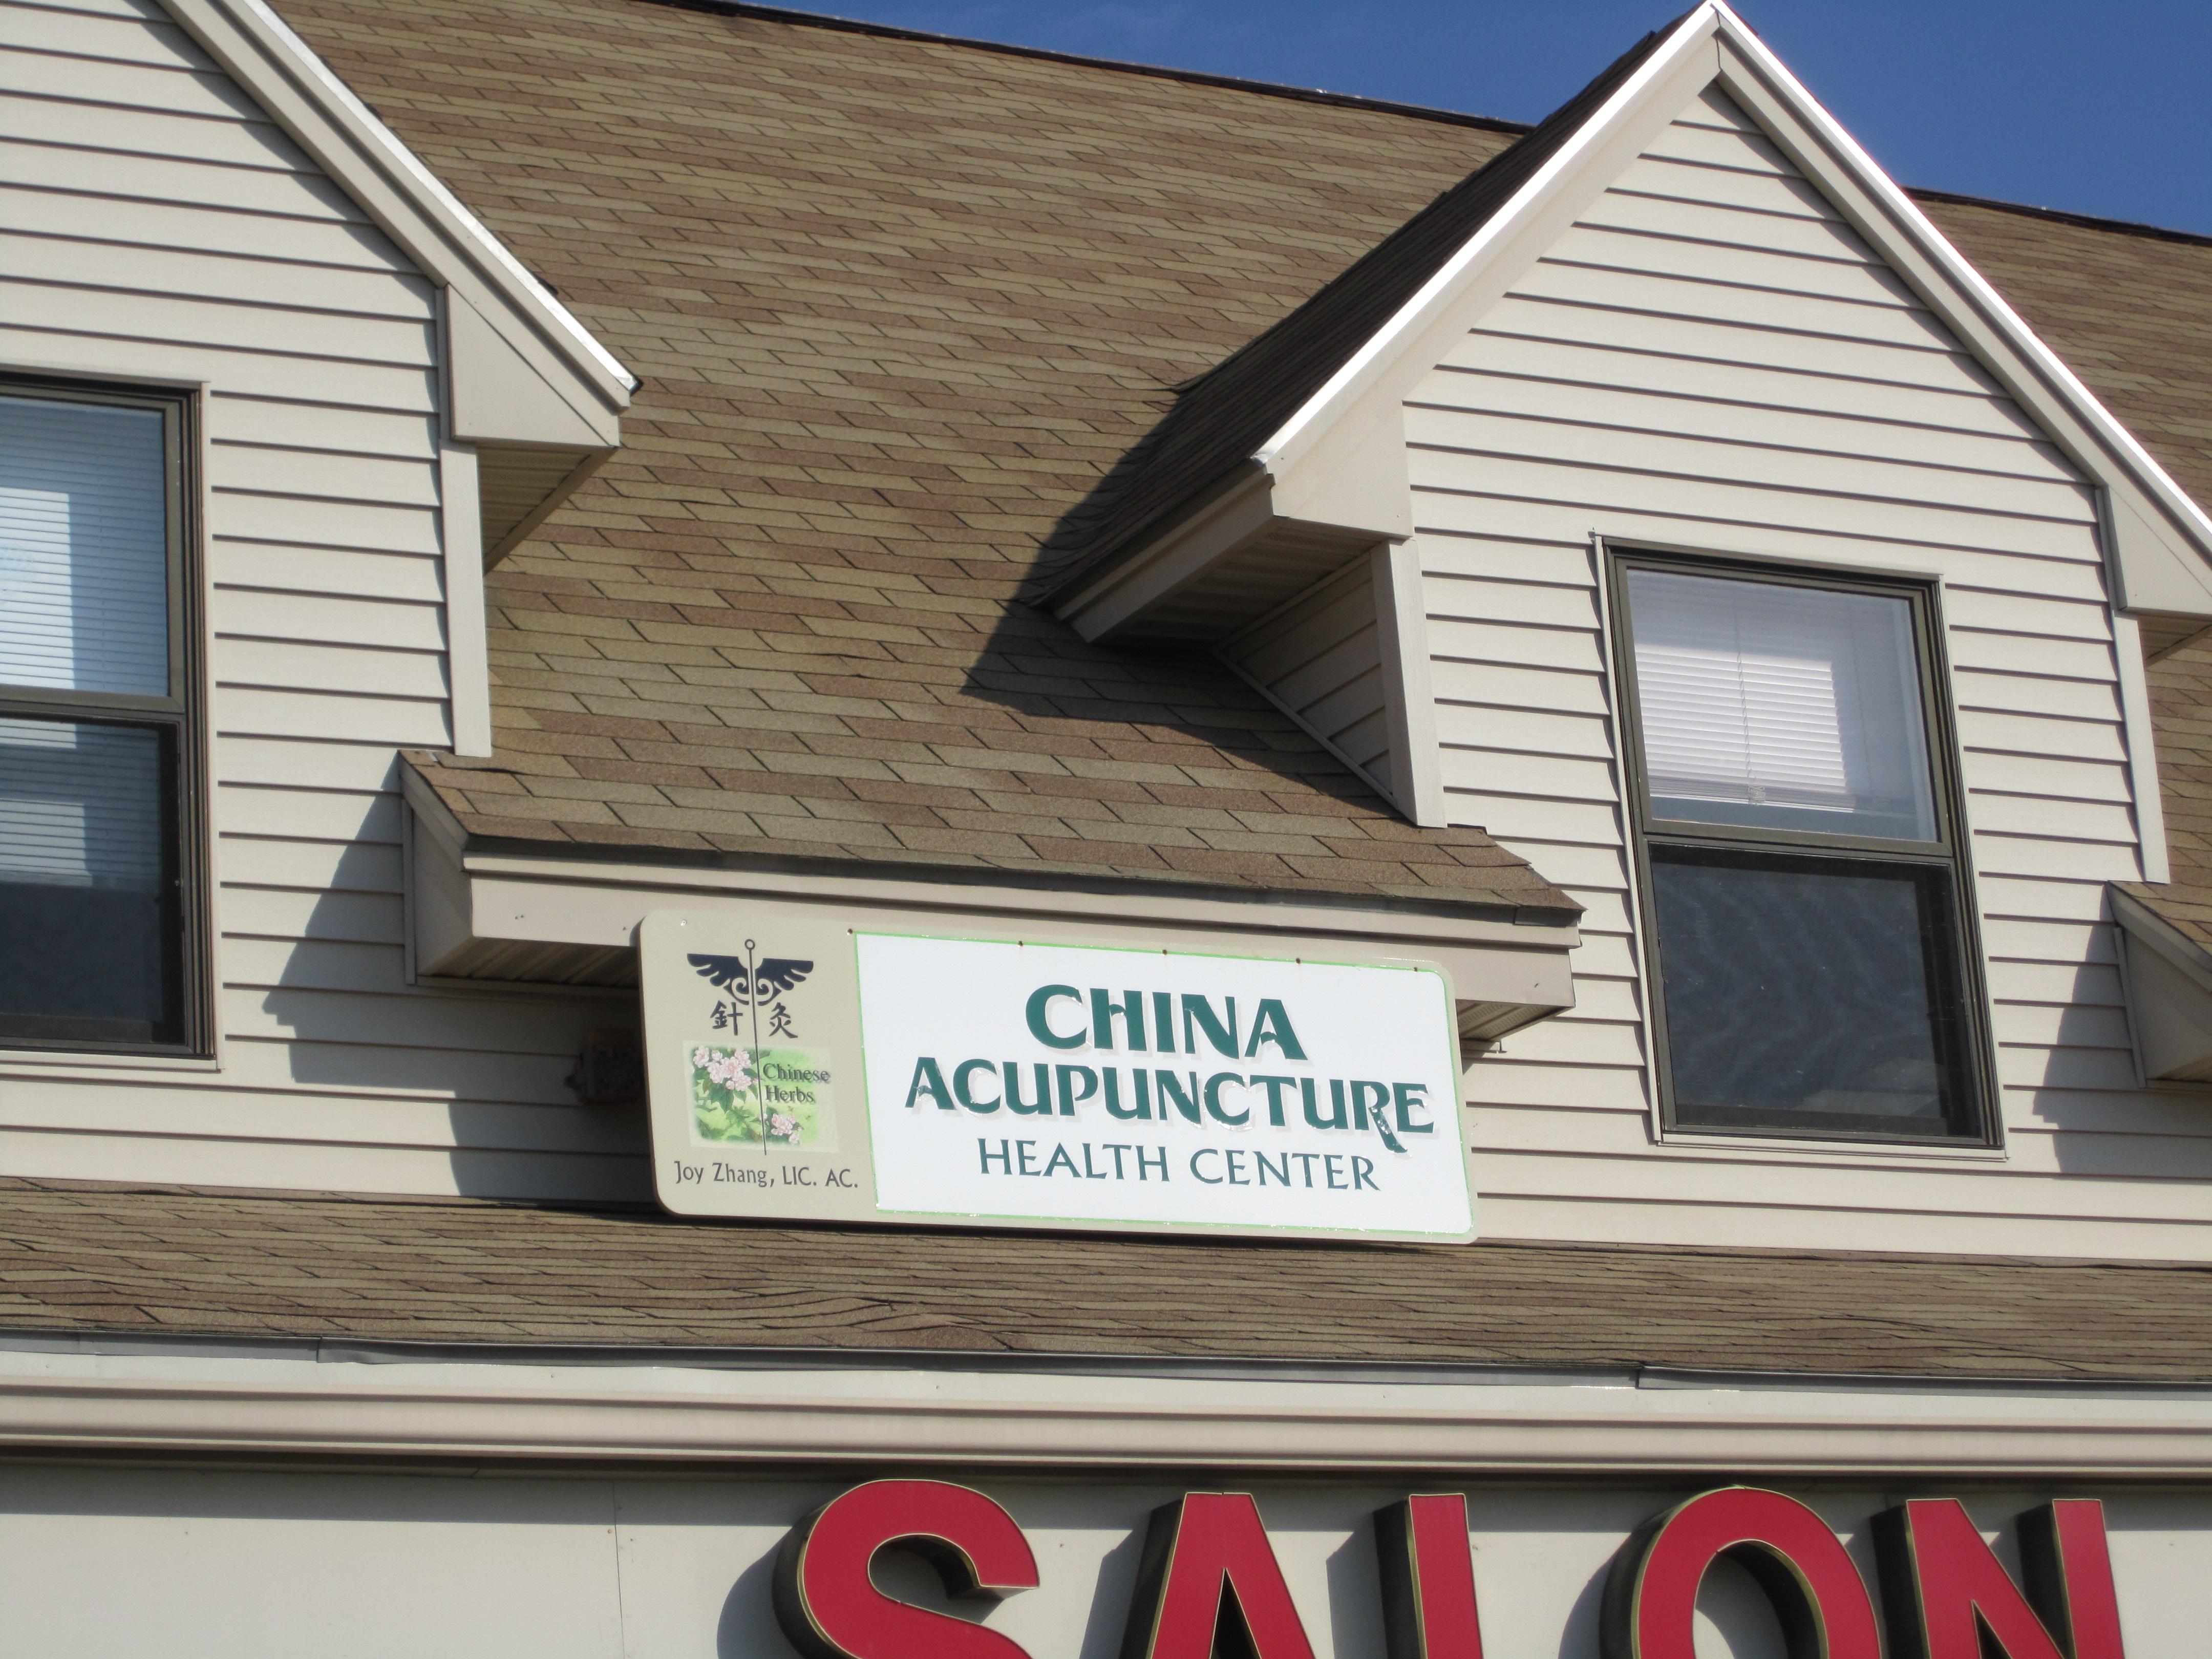 China Acupuncture Health Center, Westford Massachusetts ...